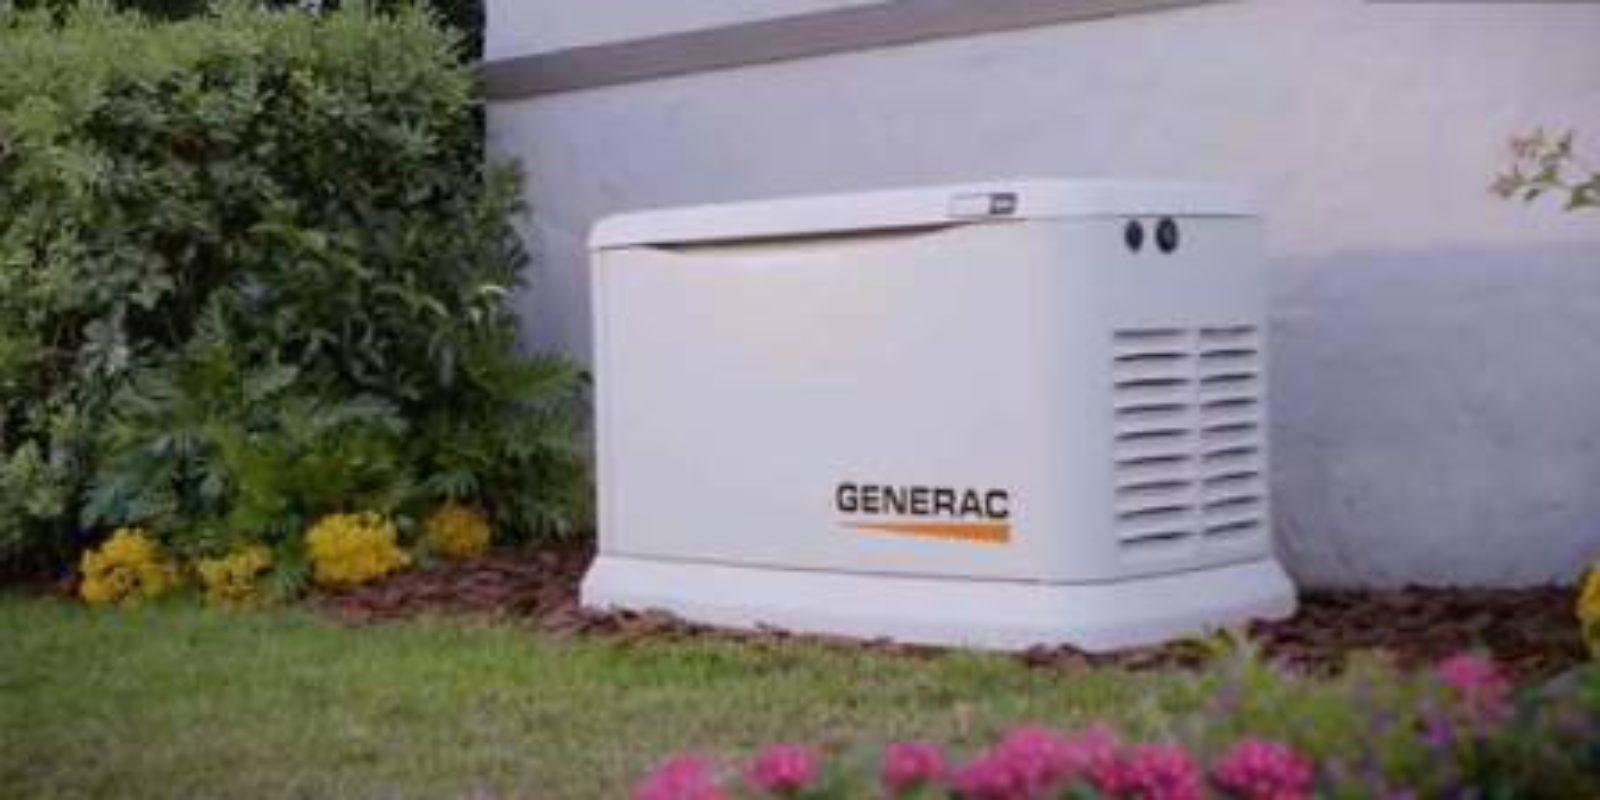 Generac 7043 22kW Home Standby Generator